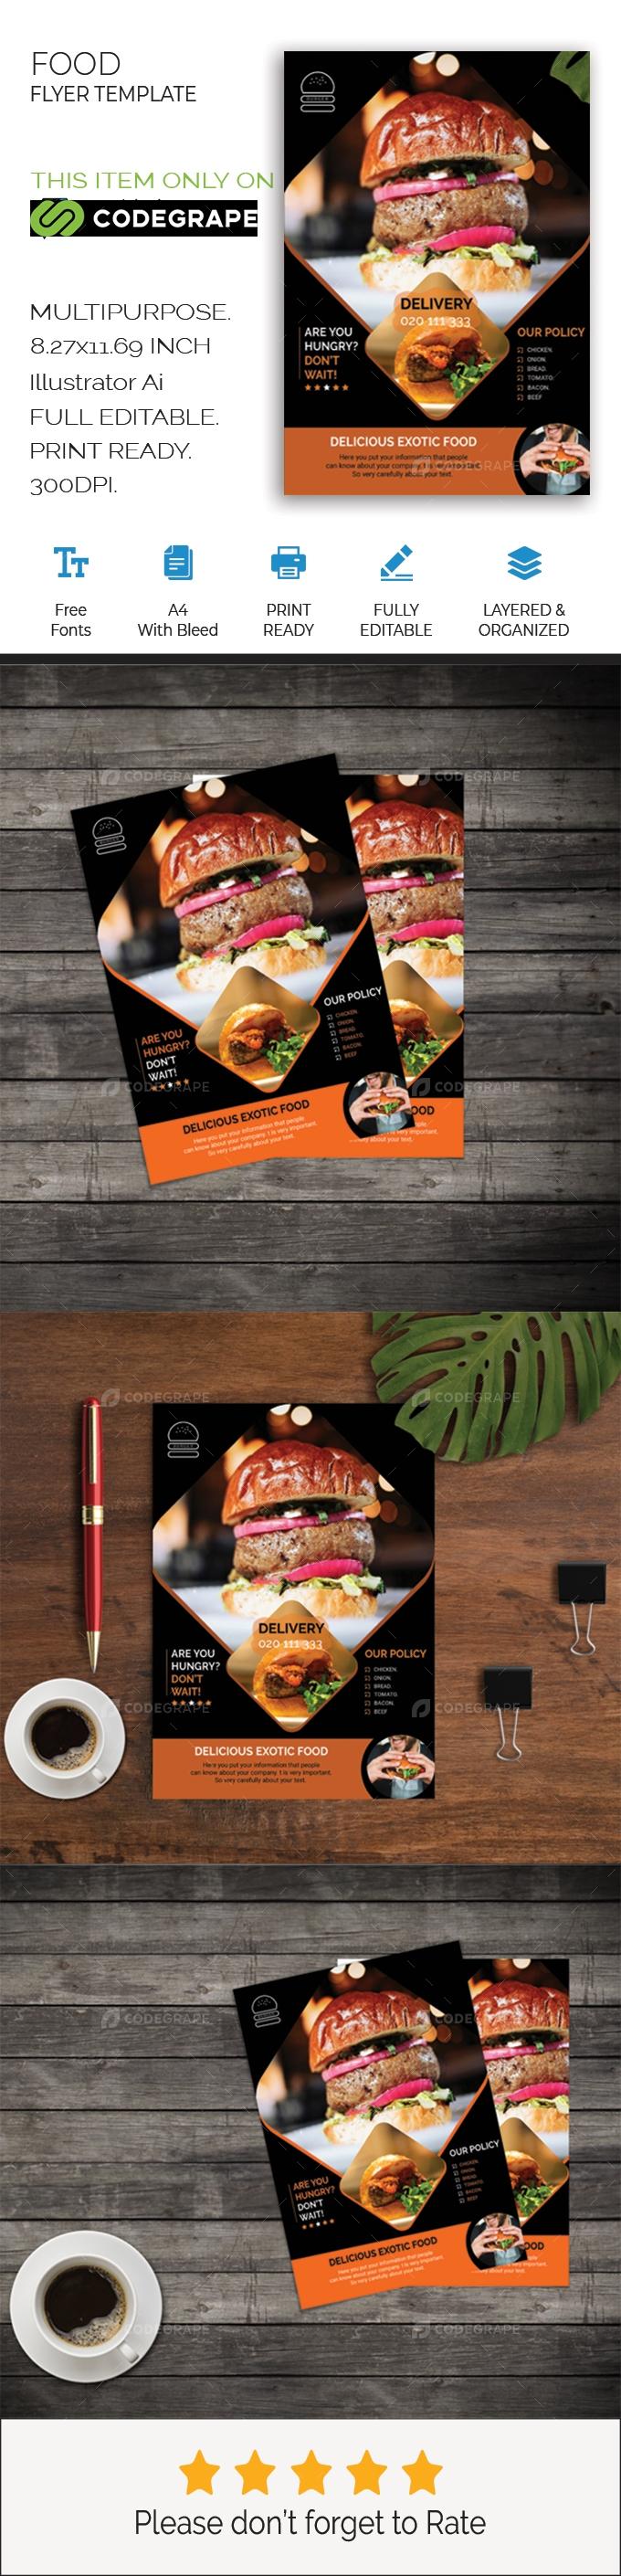 Restaurant Flyer Design Templates